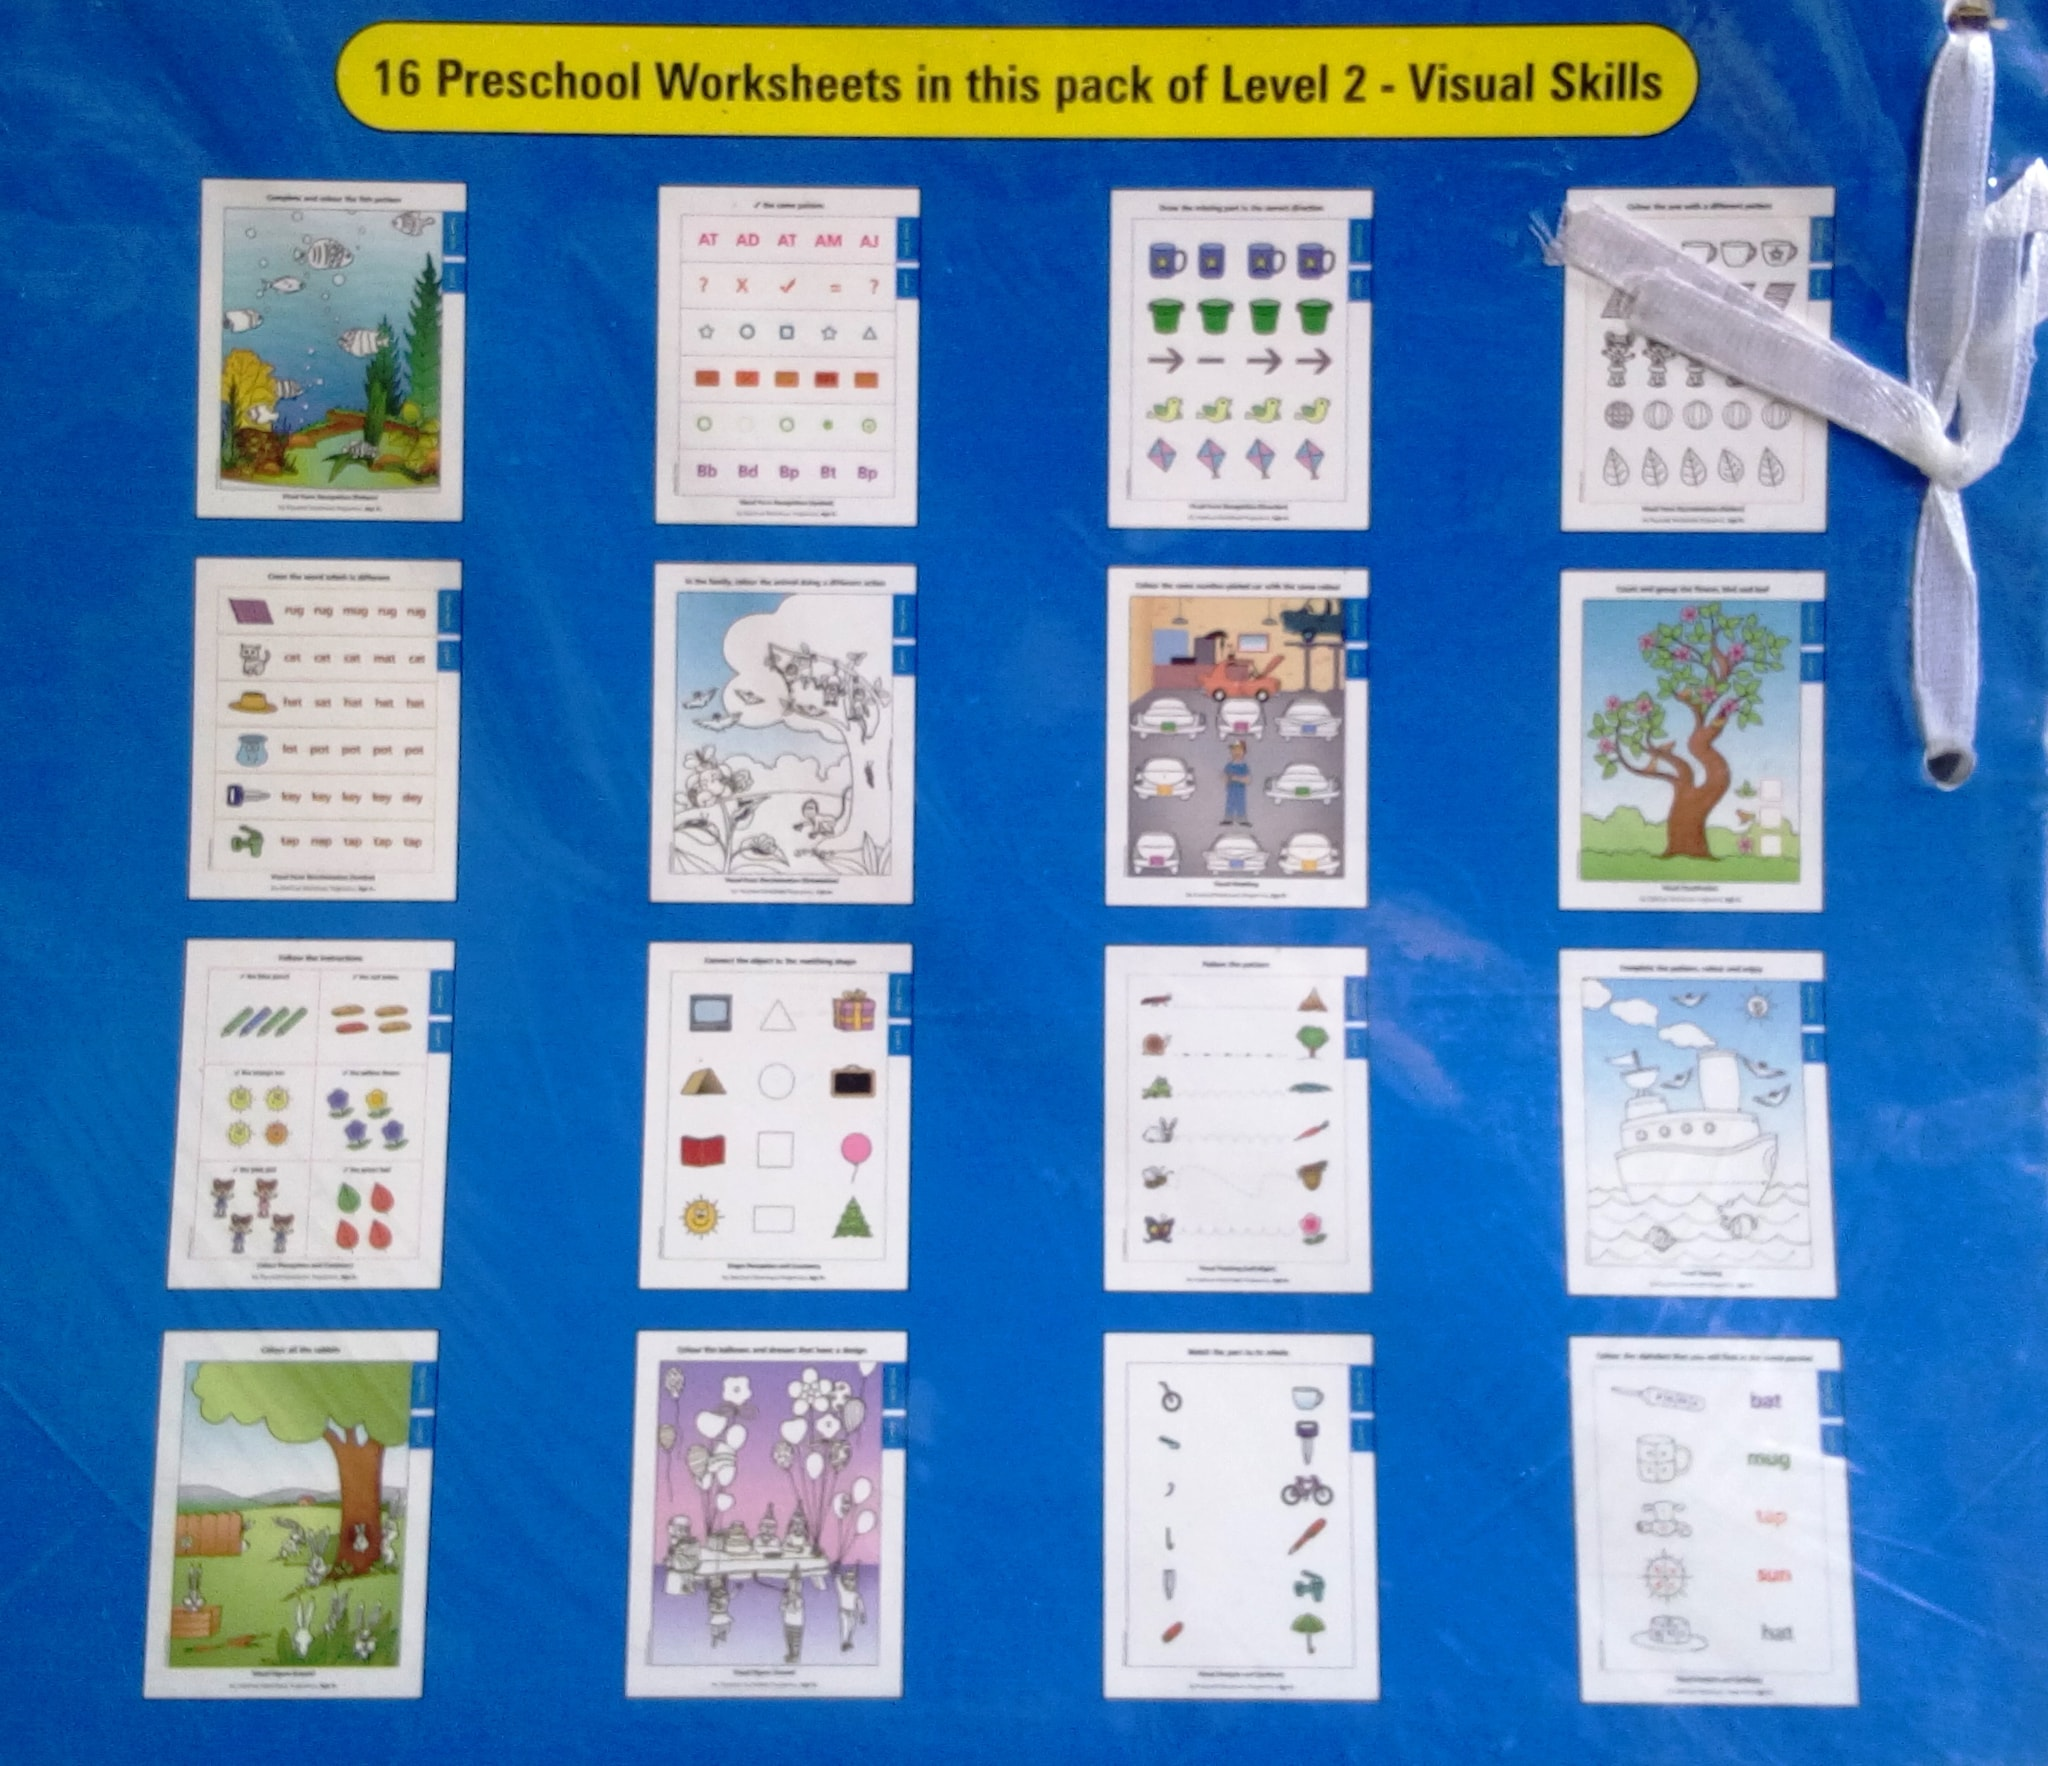 My Preschool Worksheets Visual Skills Level 2 (age 4+)